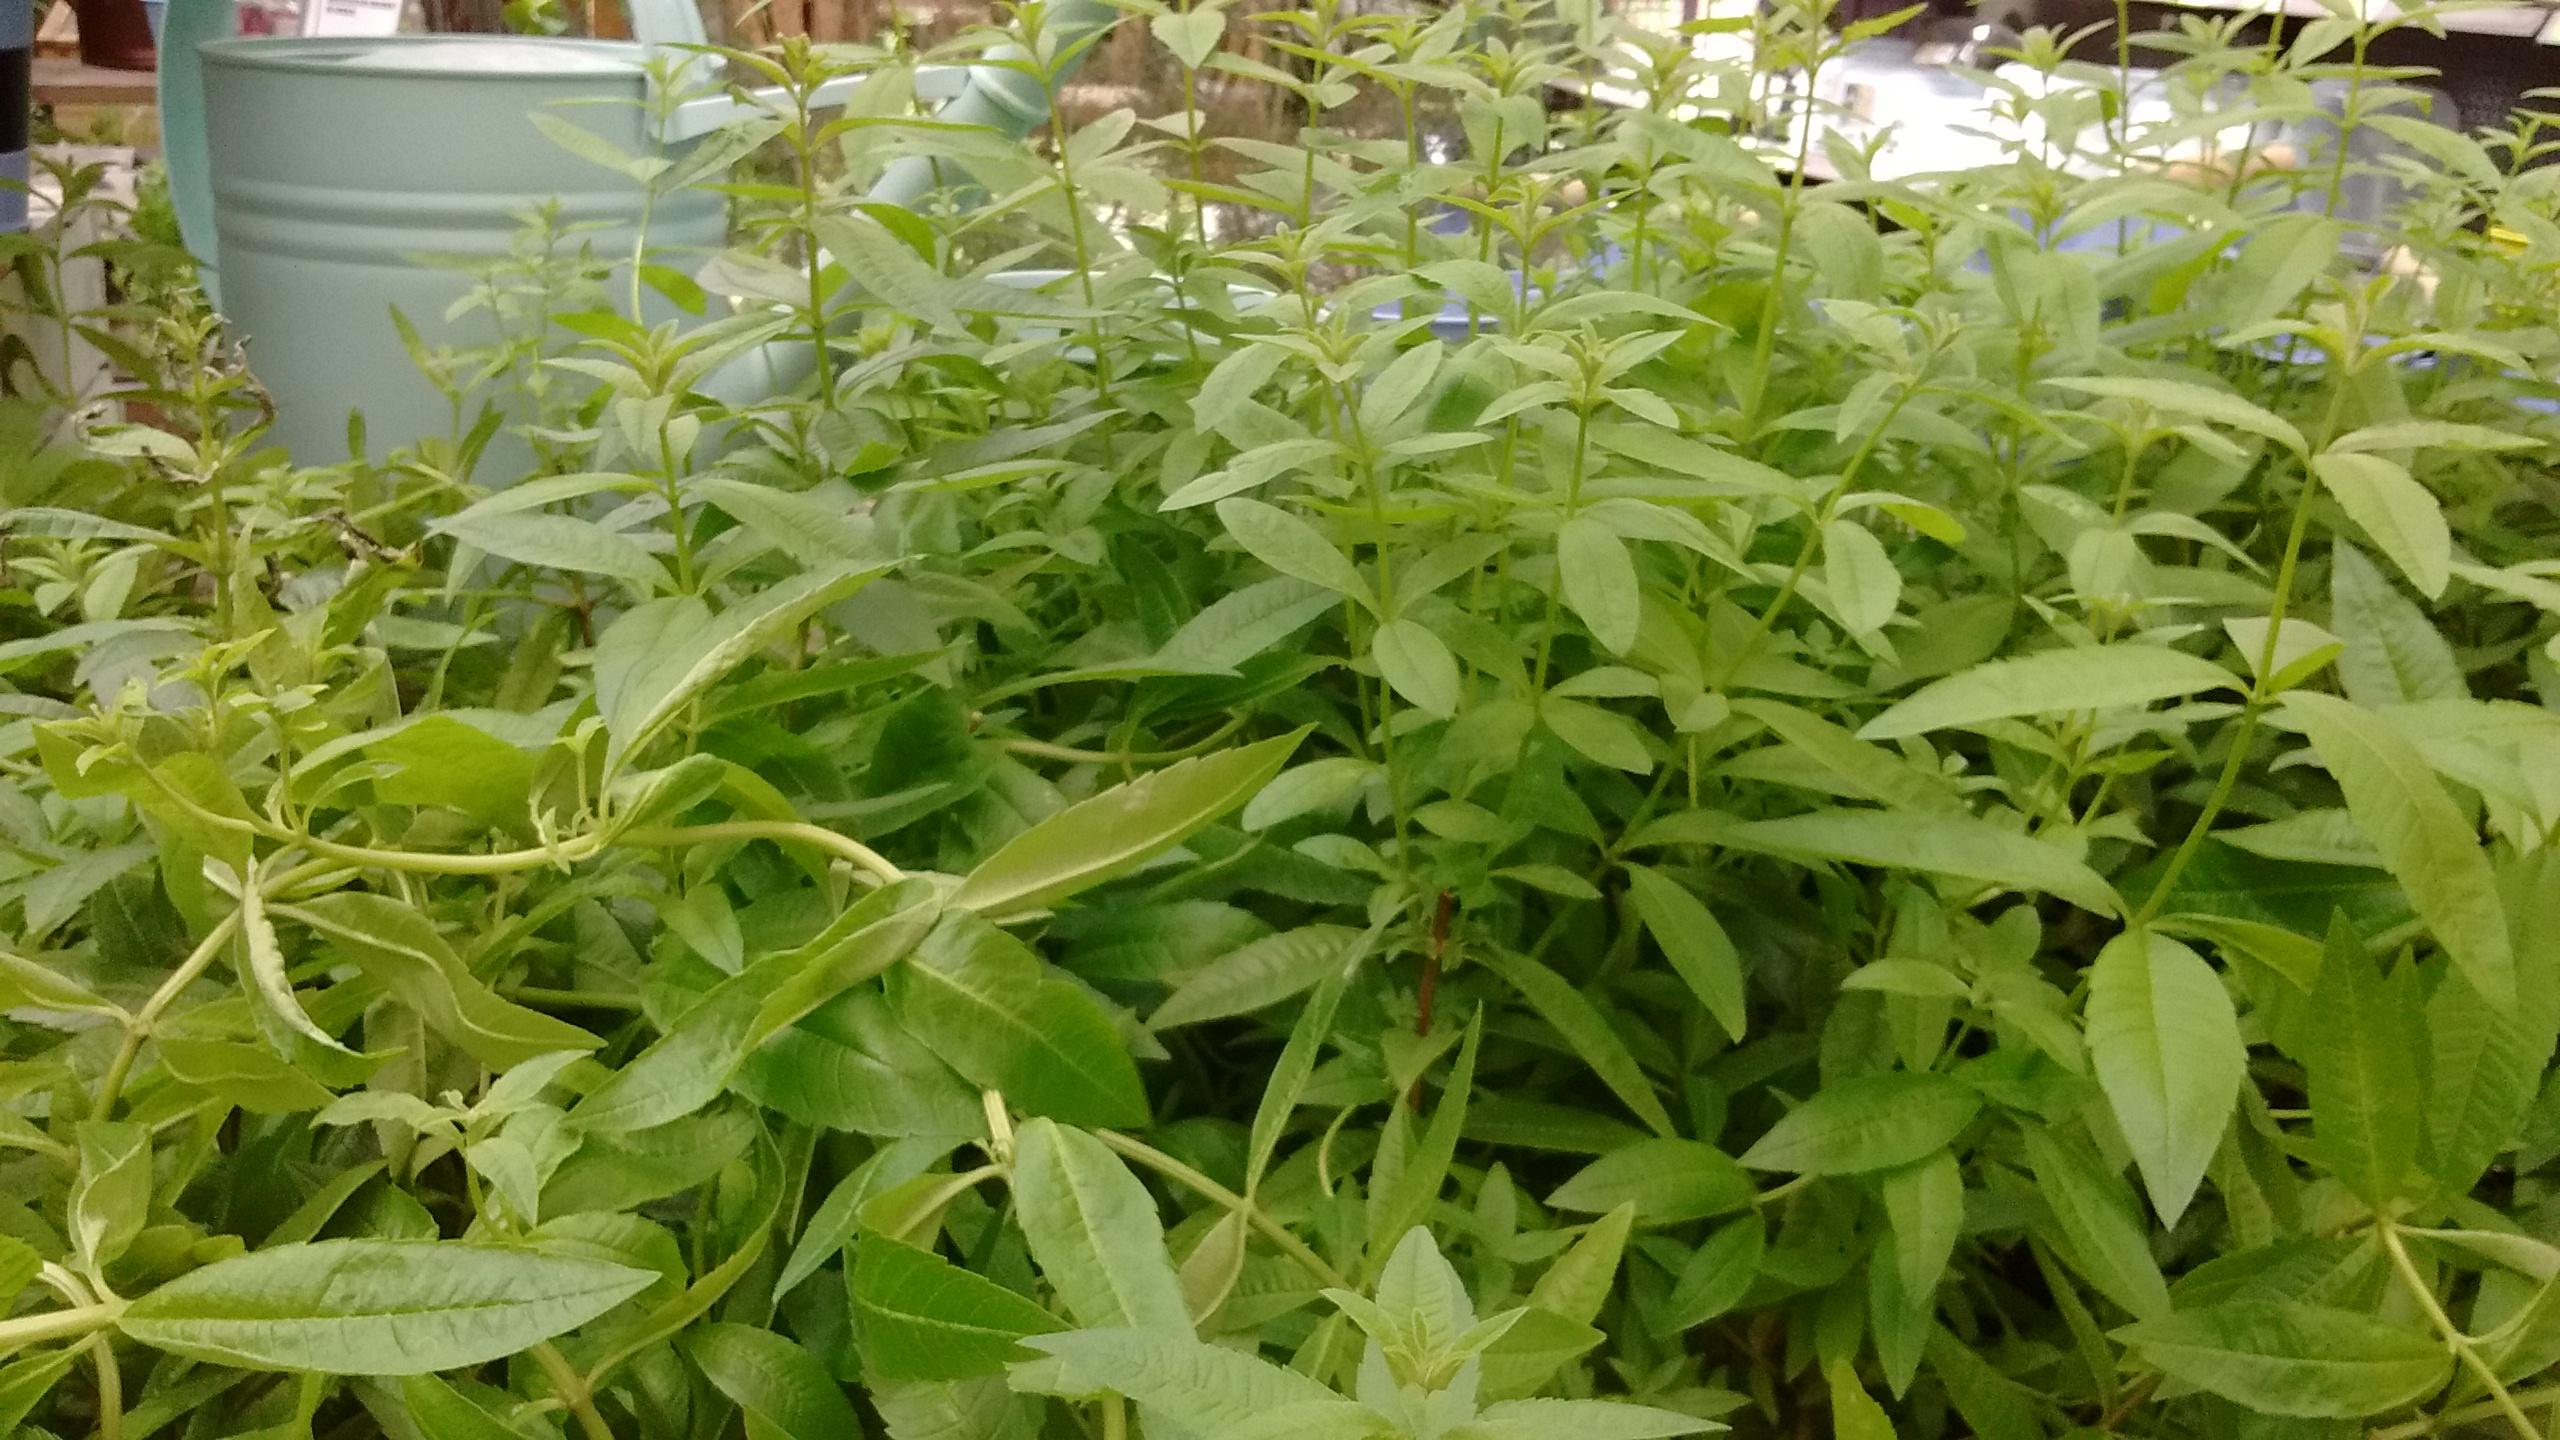 Aloysia atriphylla